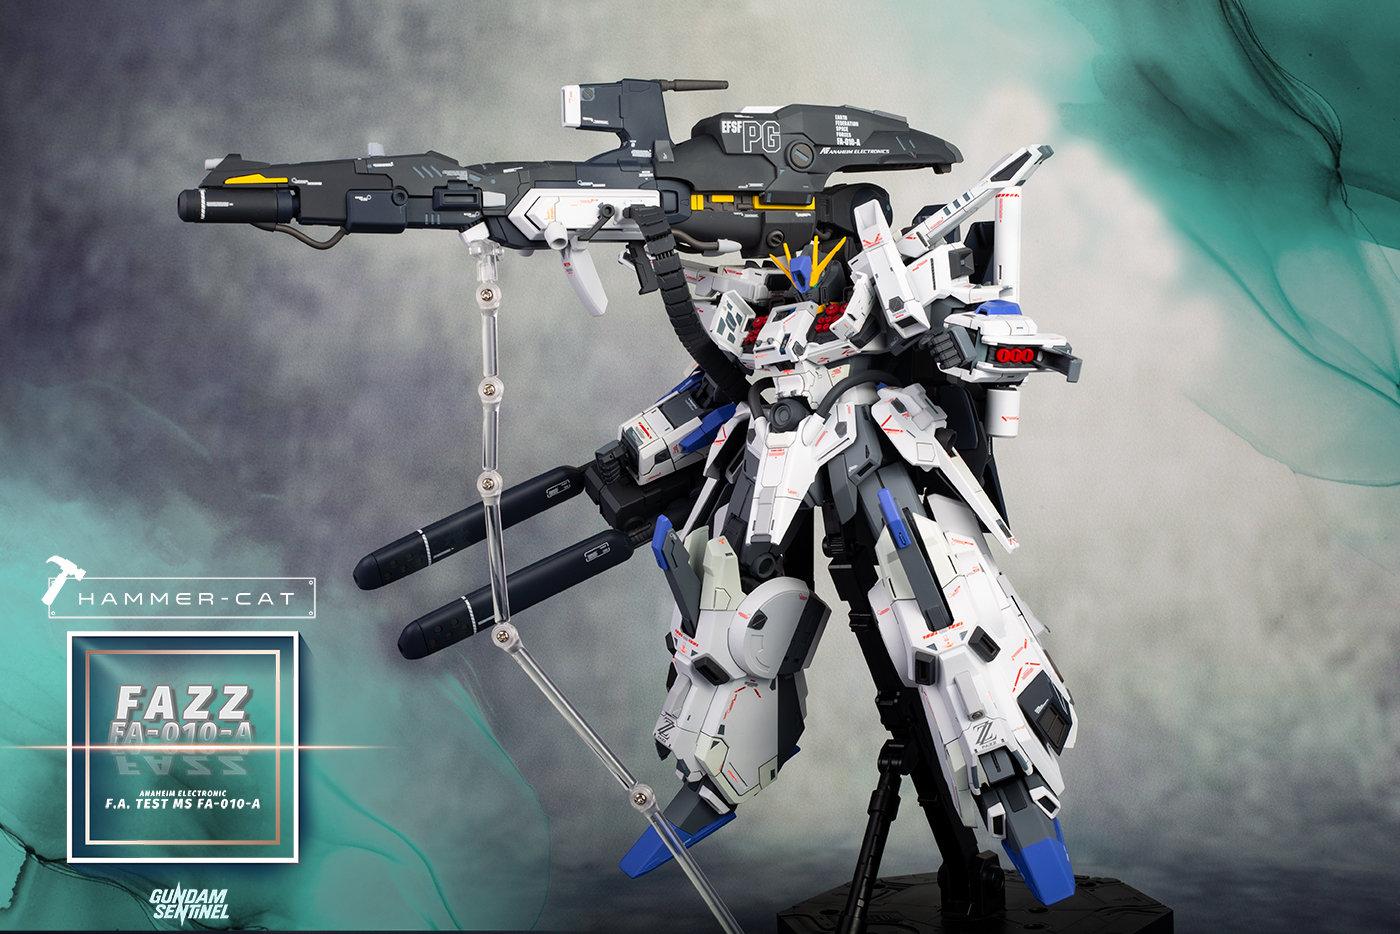 G748_MG_FAZZ_info_008.jpg